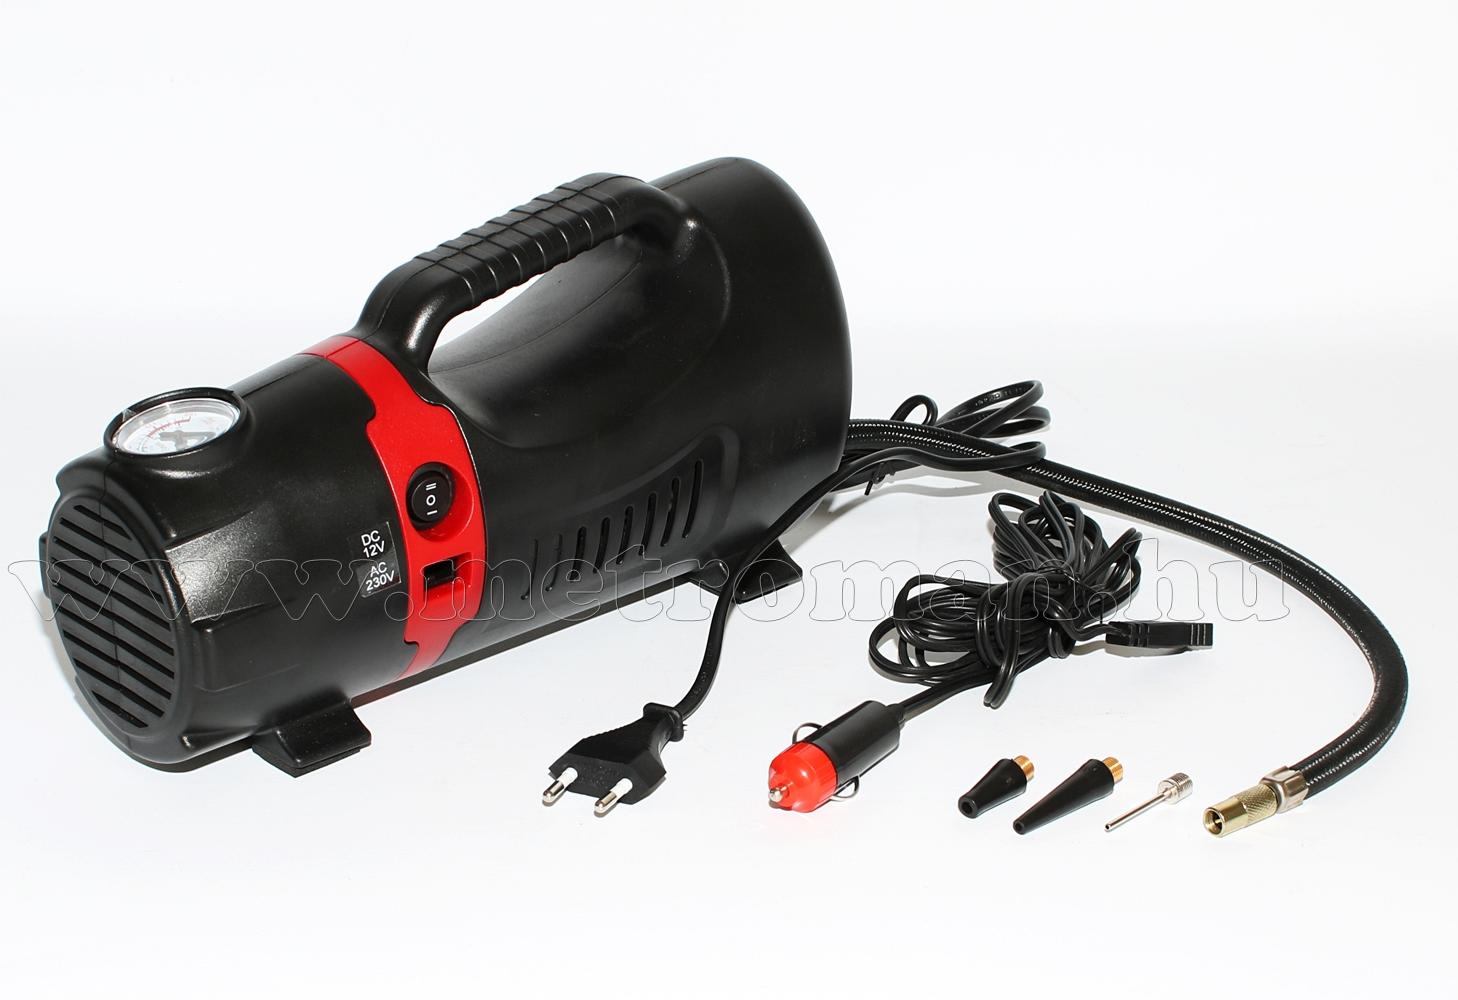 Autós kompresszor, autópumpa 12/230 Volt, MM-8723A